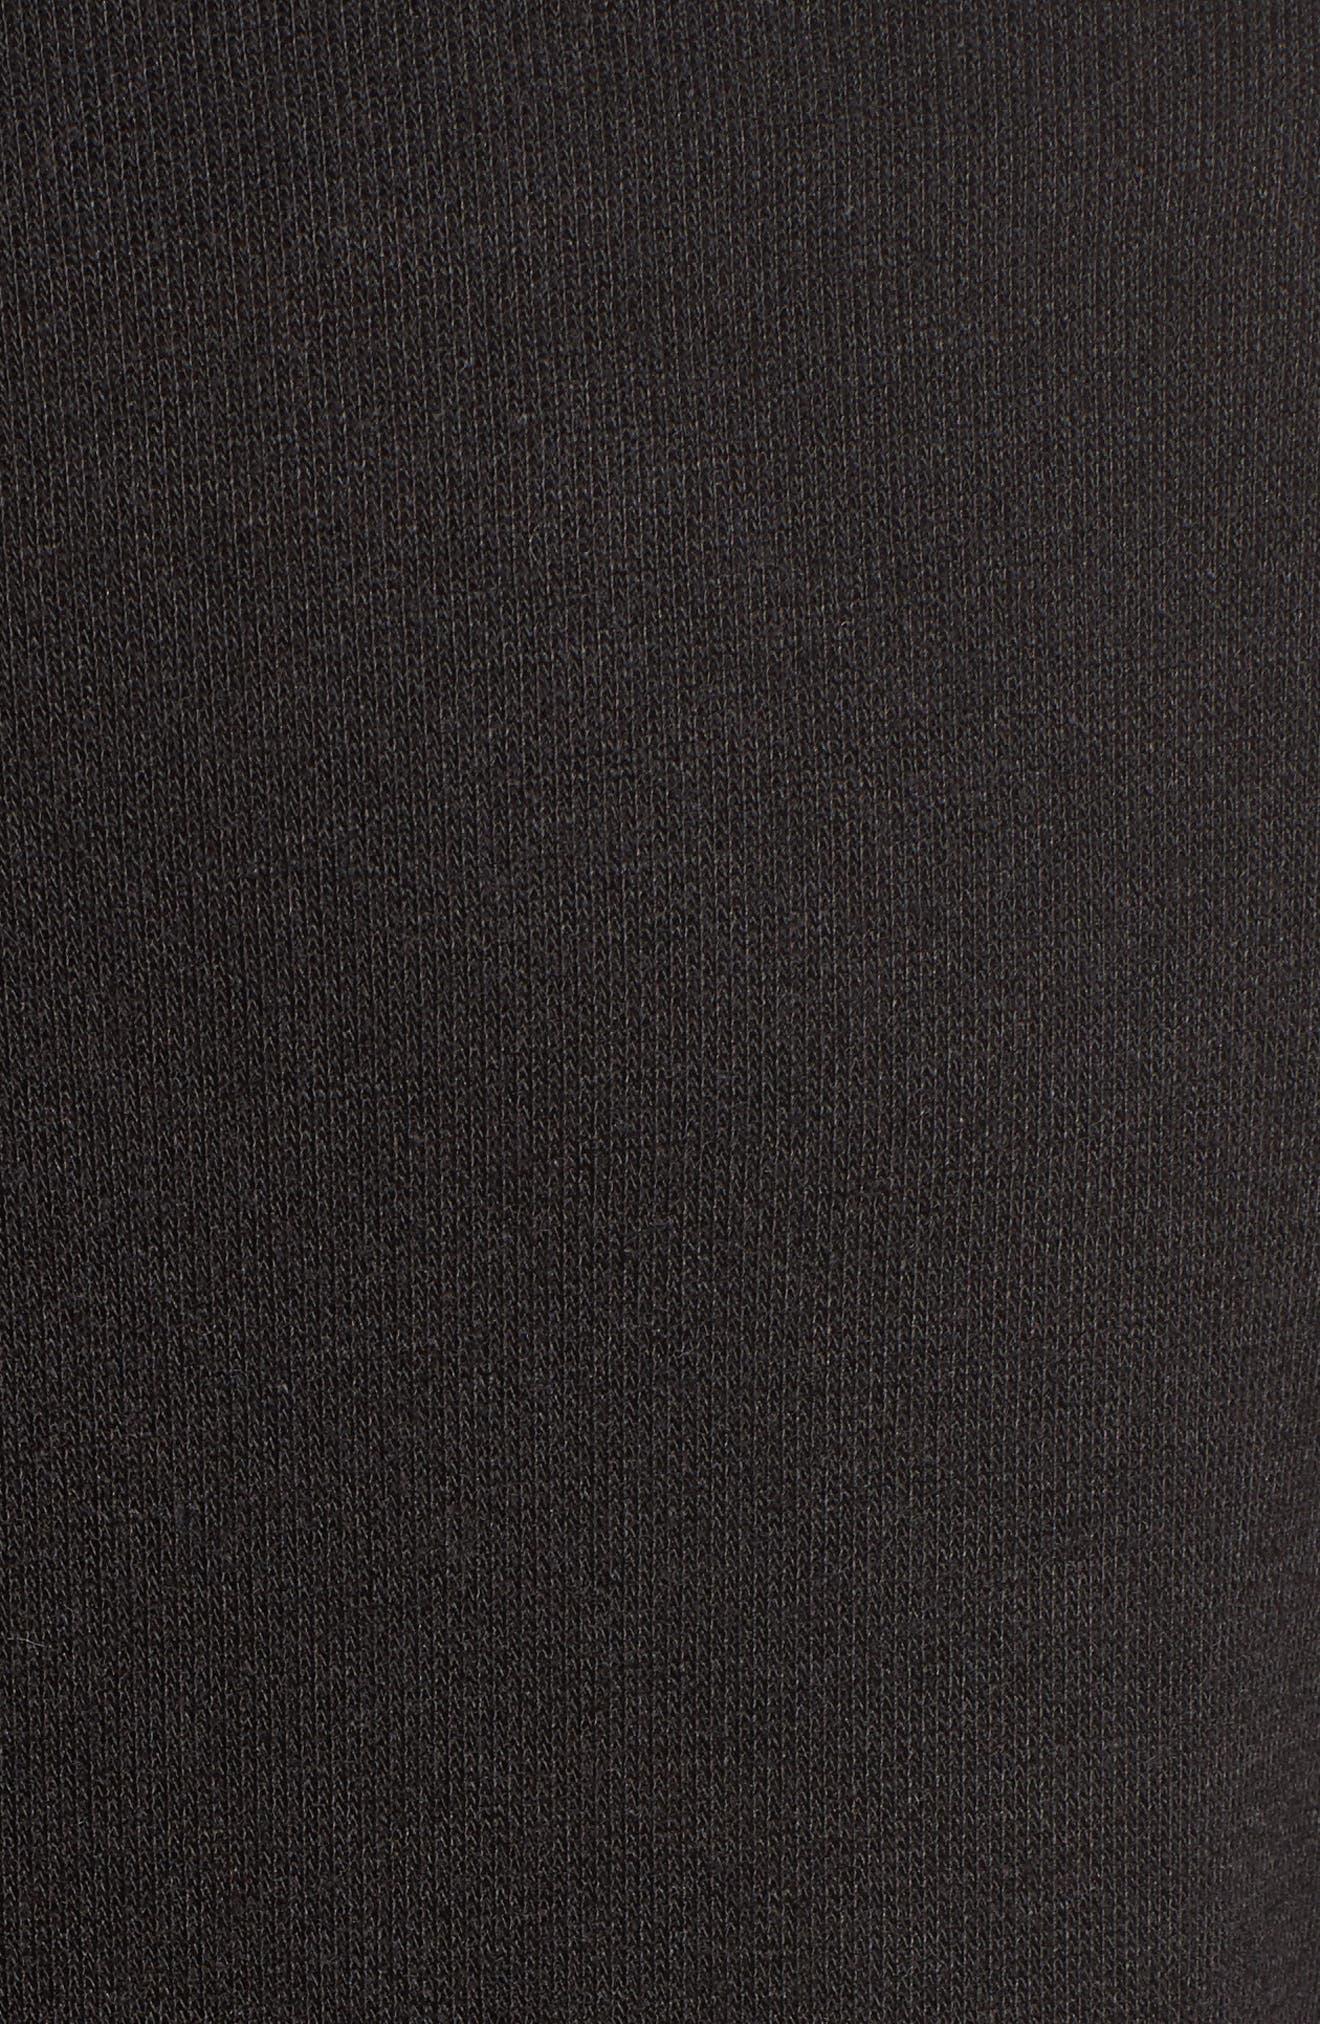 Bateau Neck Knit Tunic,                             Alternate thumbnail 5, color,                             001